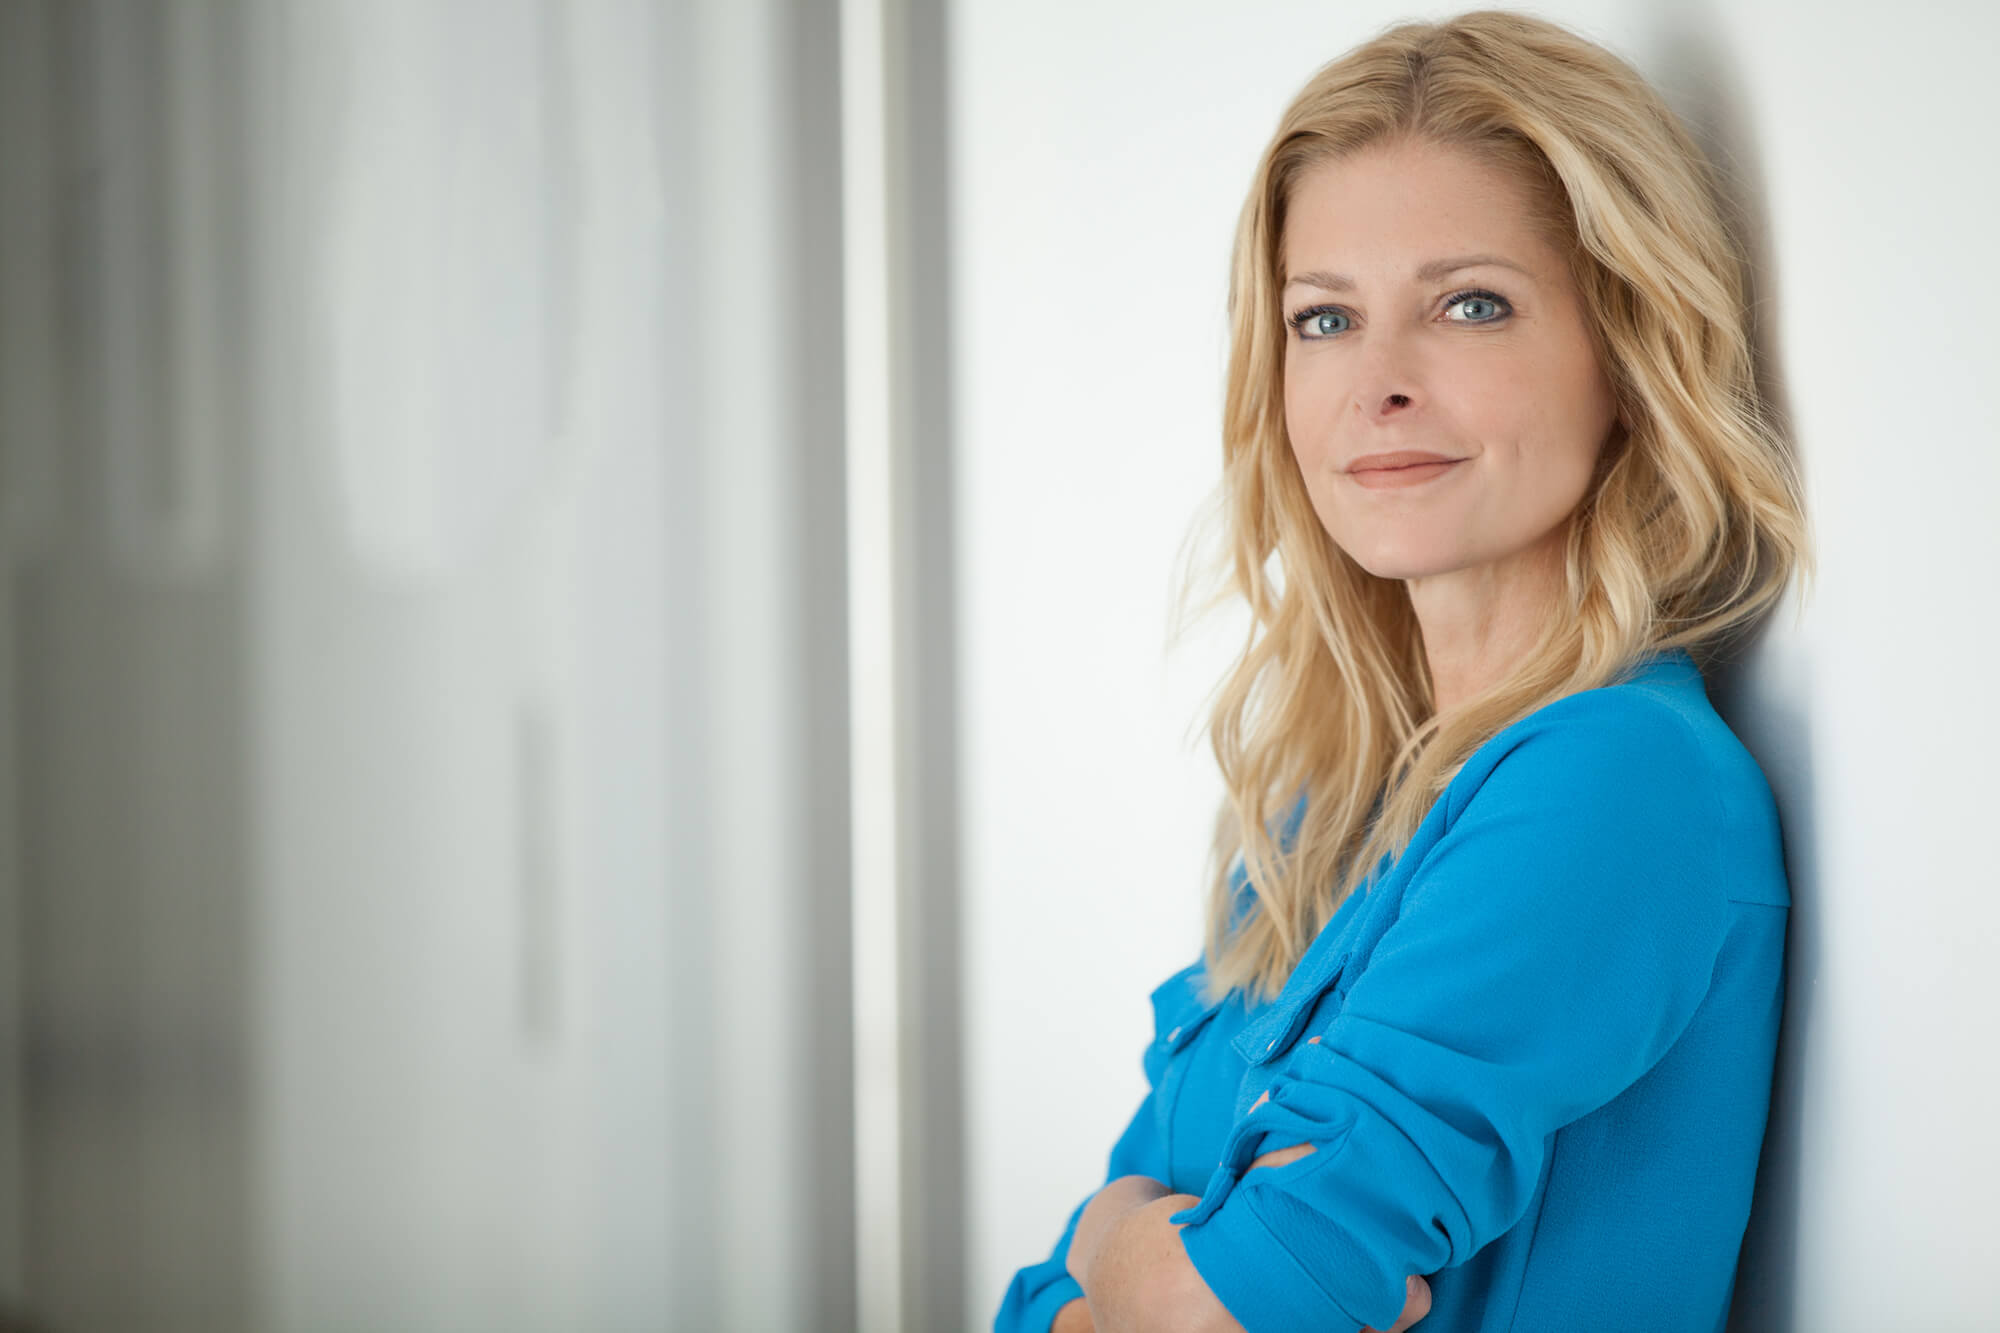 Verena Zechner Background